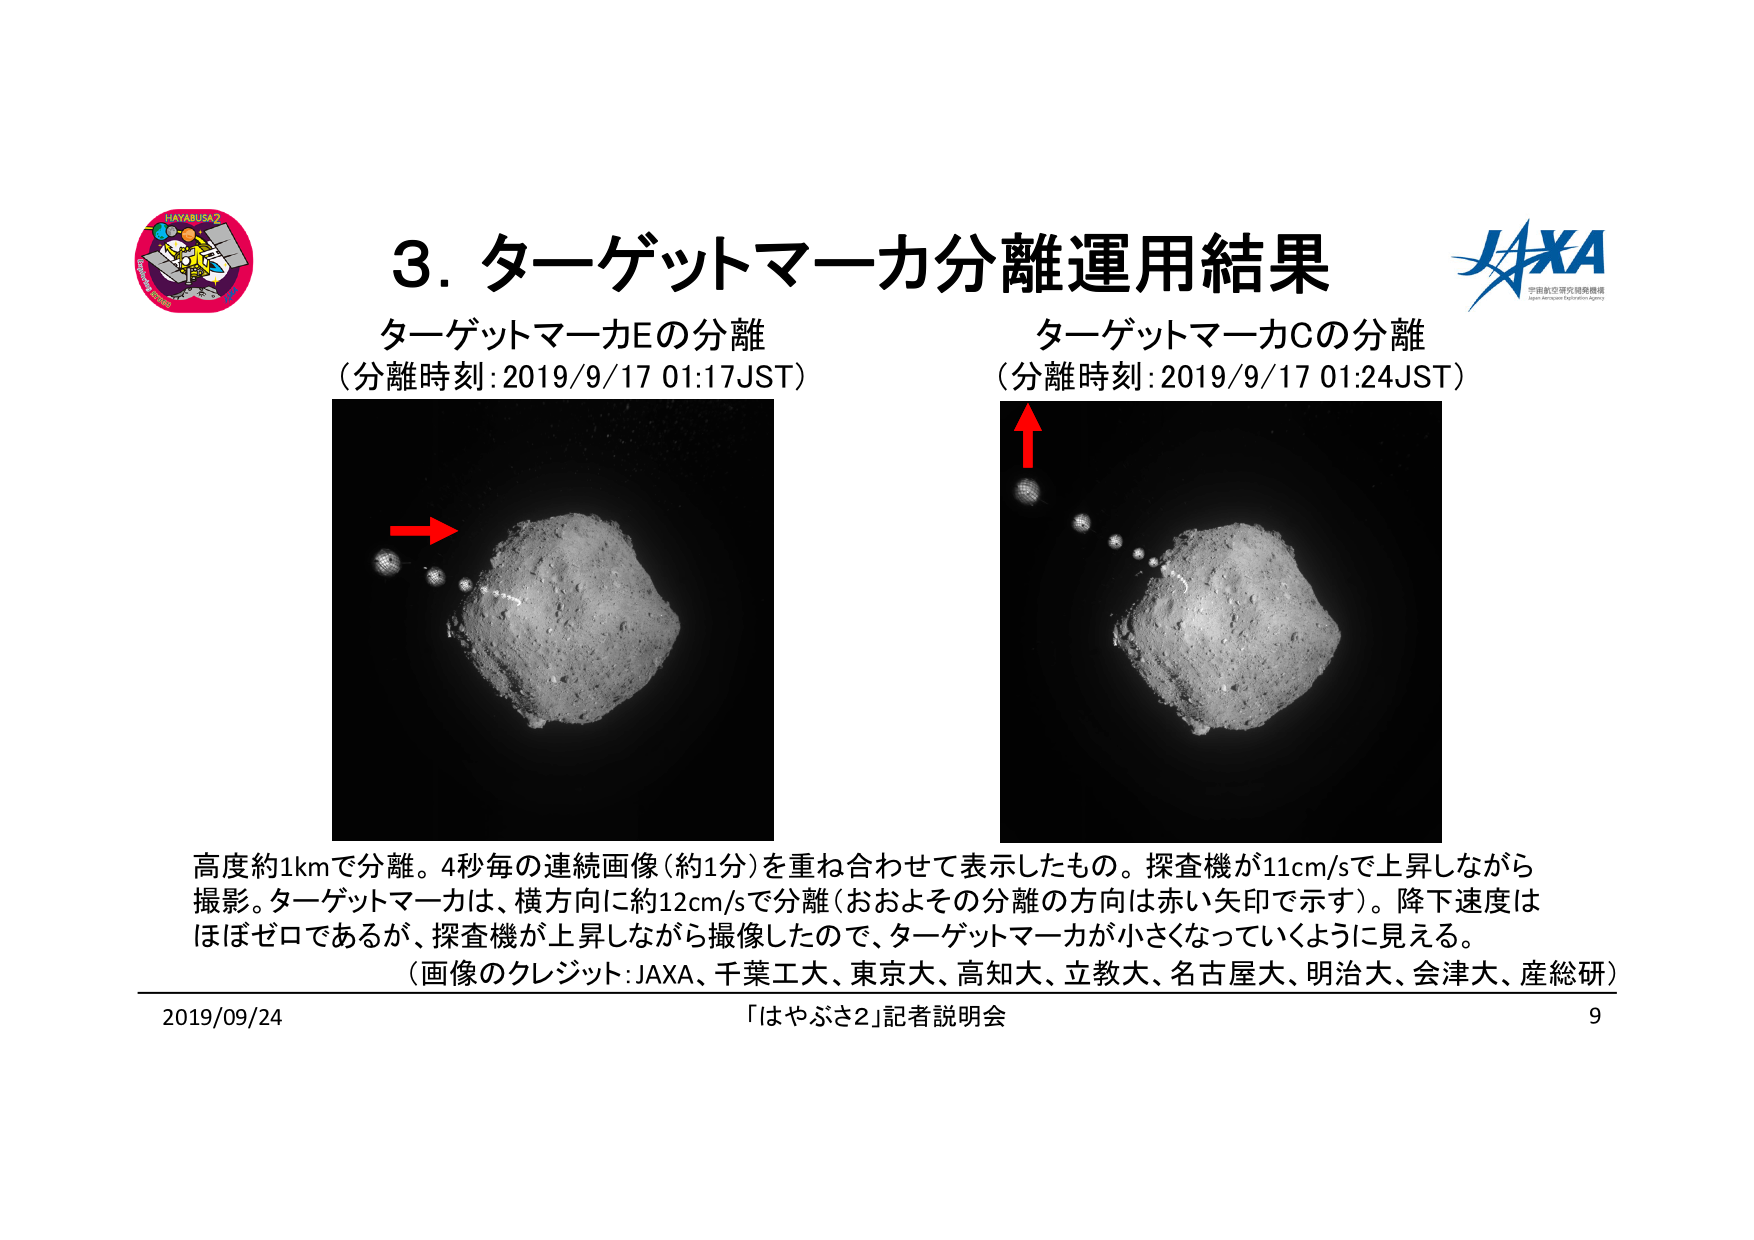 f:id:Imamura:20190924122522p:plain